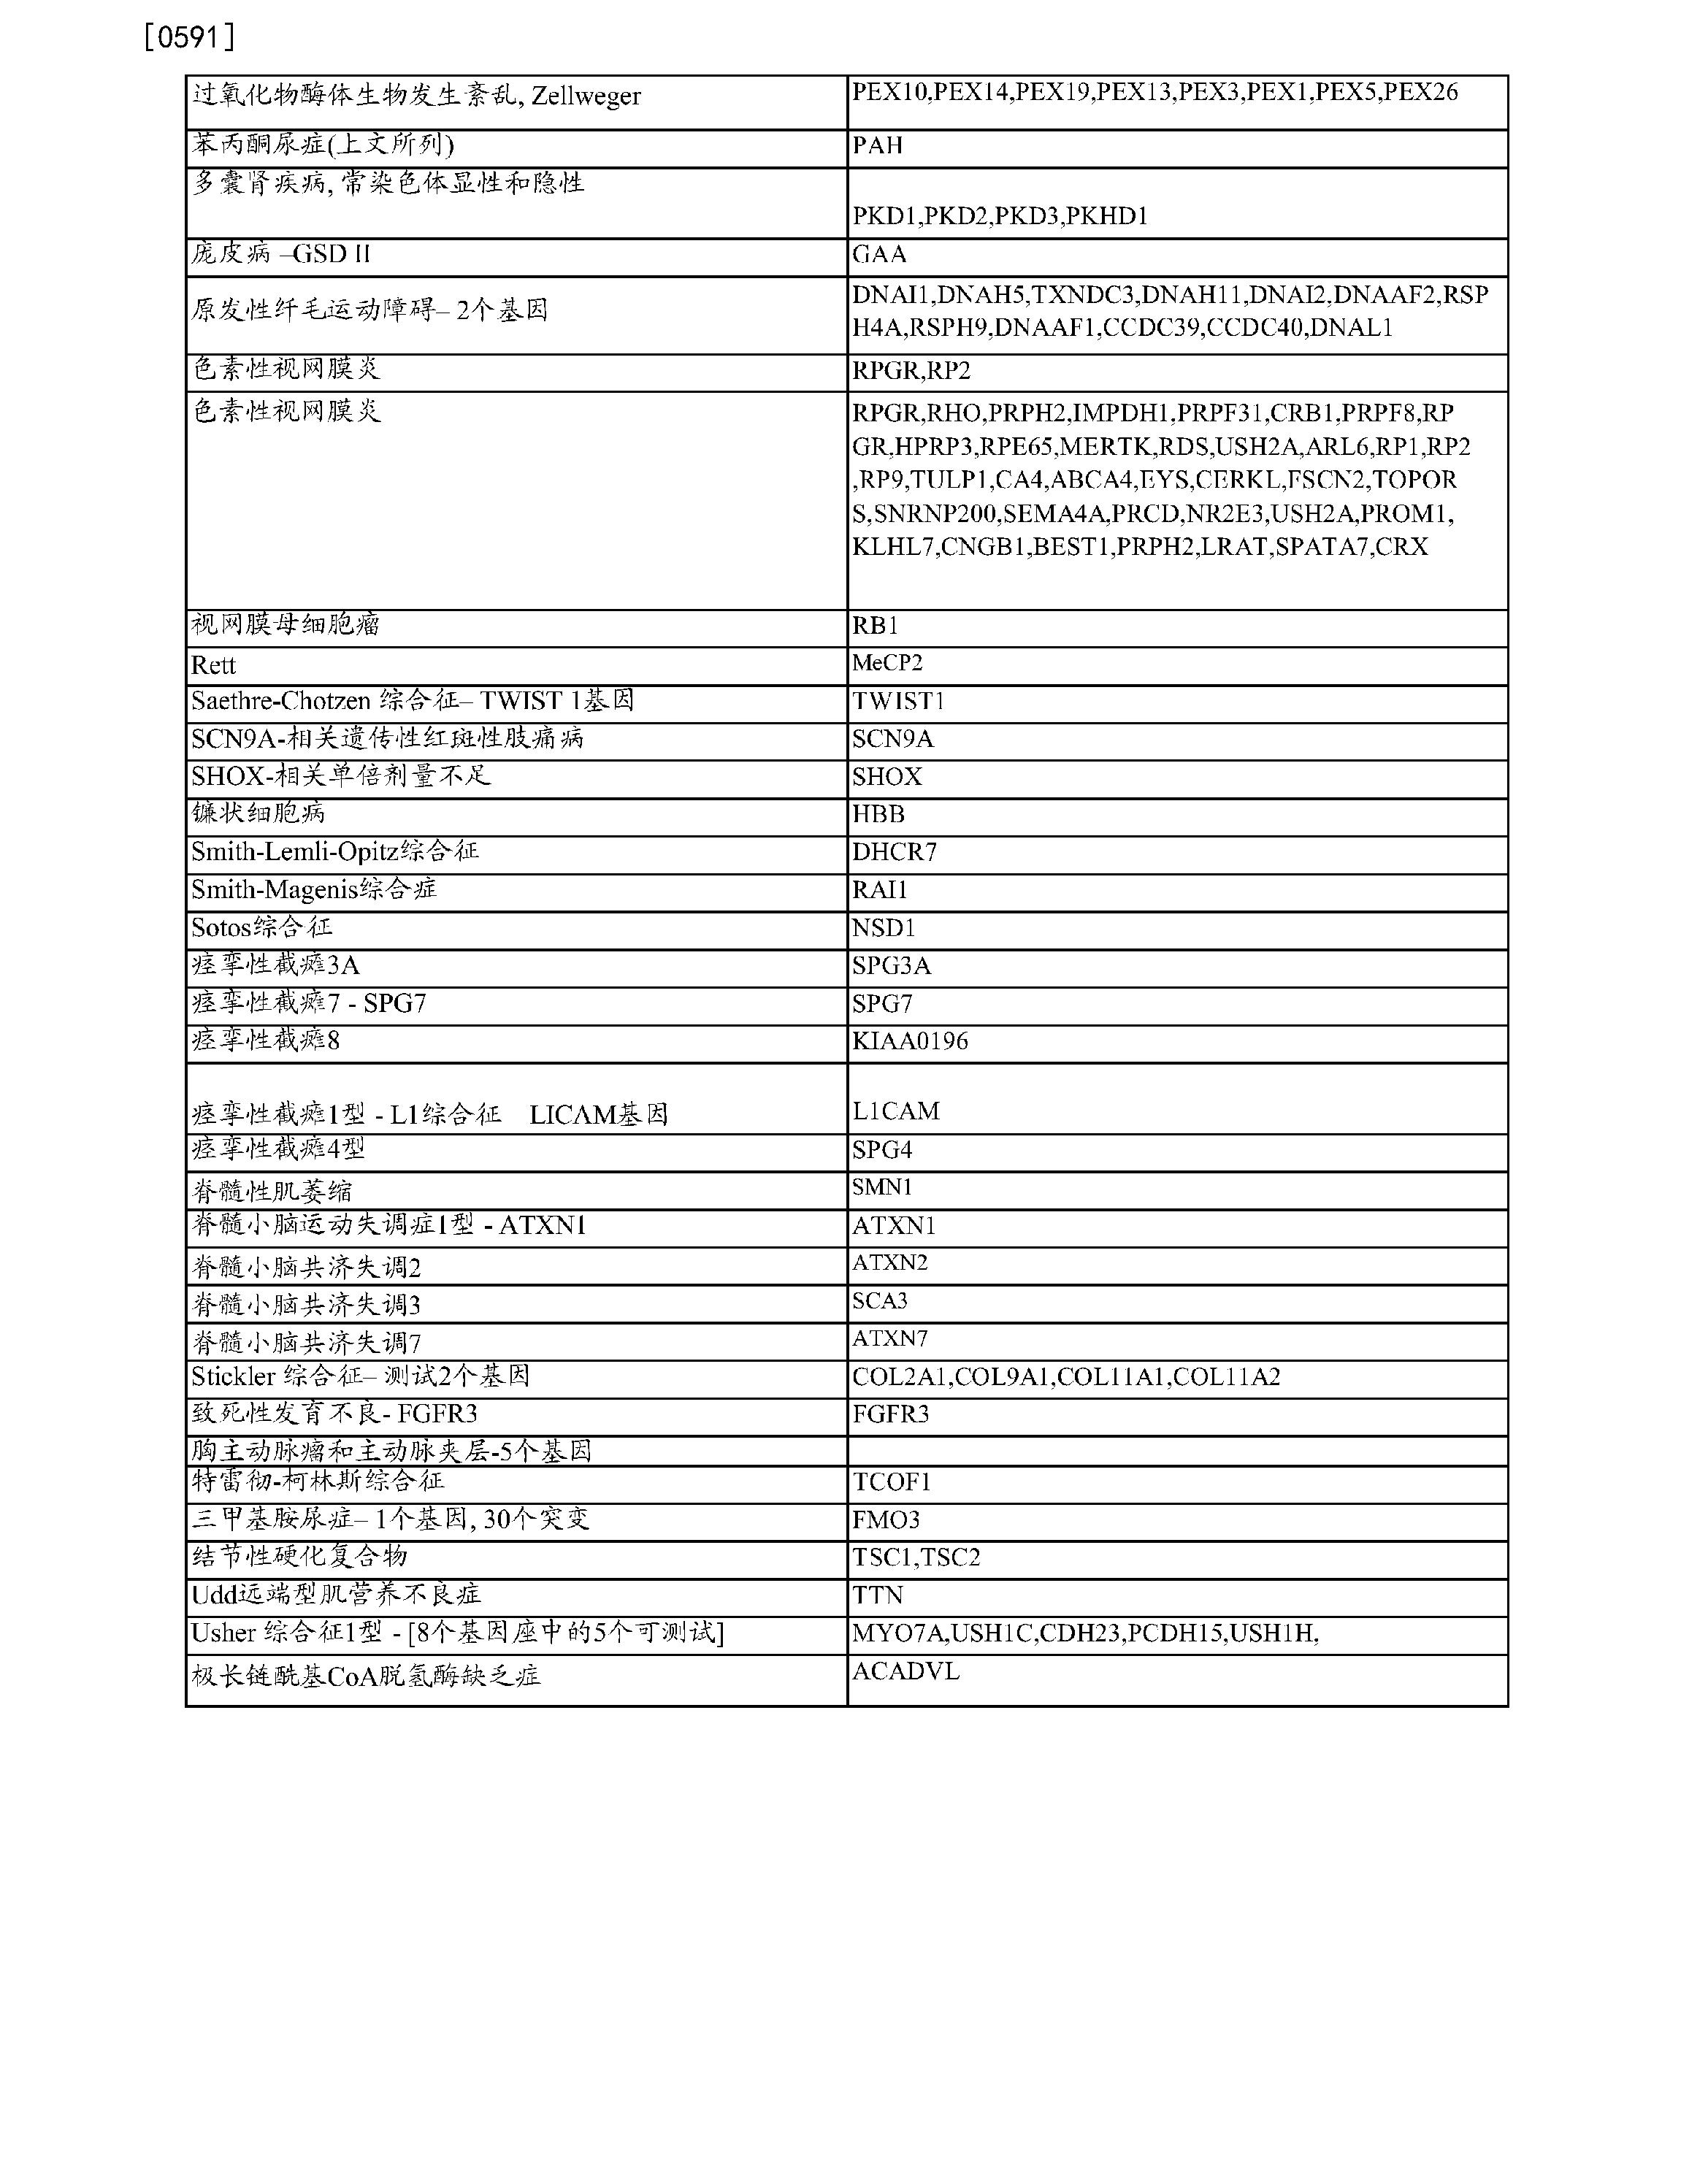 Pi18080: Rsv-val-0002: Invalid Expression (   )  Crx-api-0004 Data Size